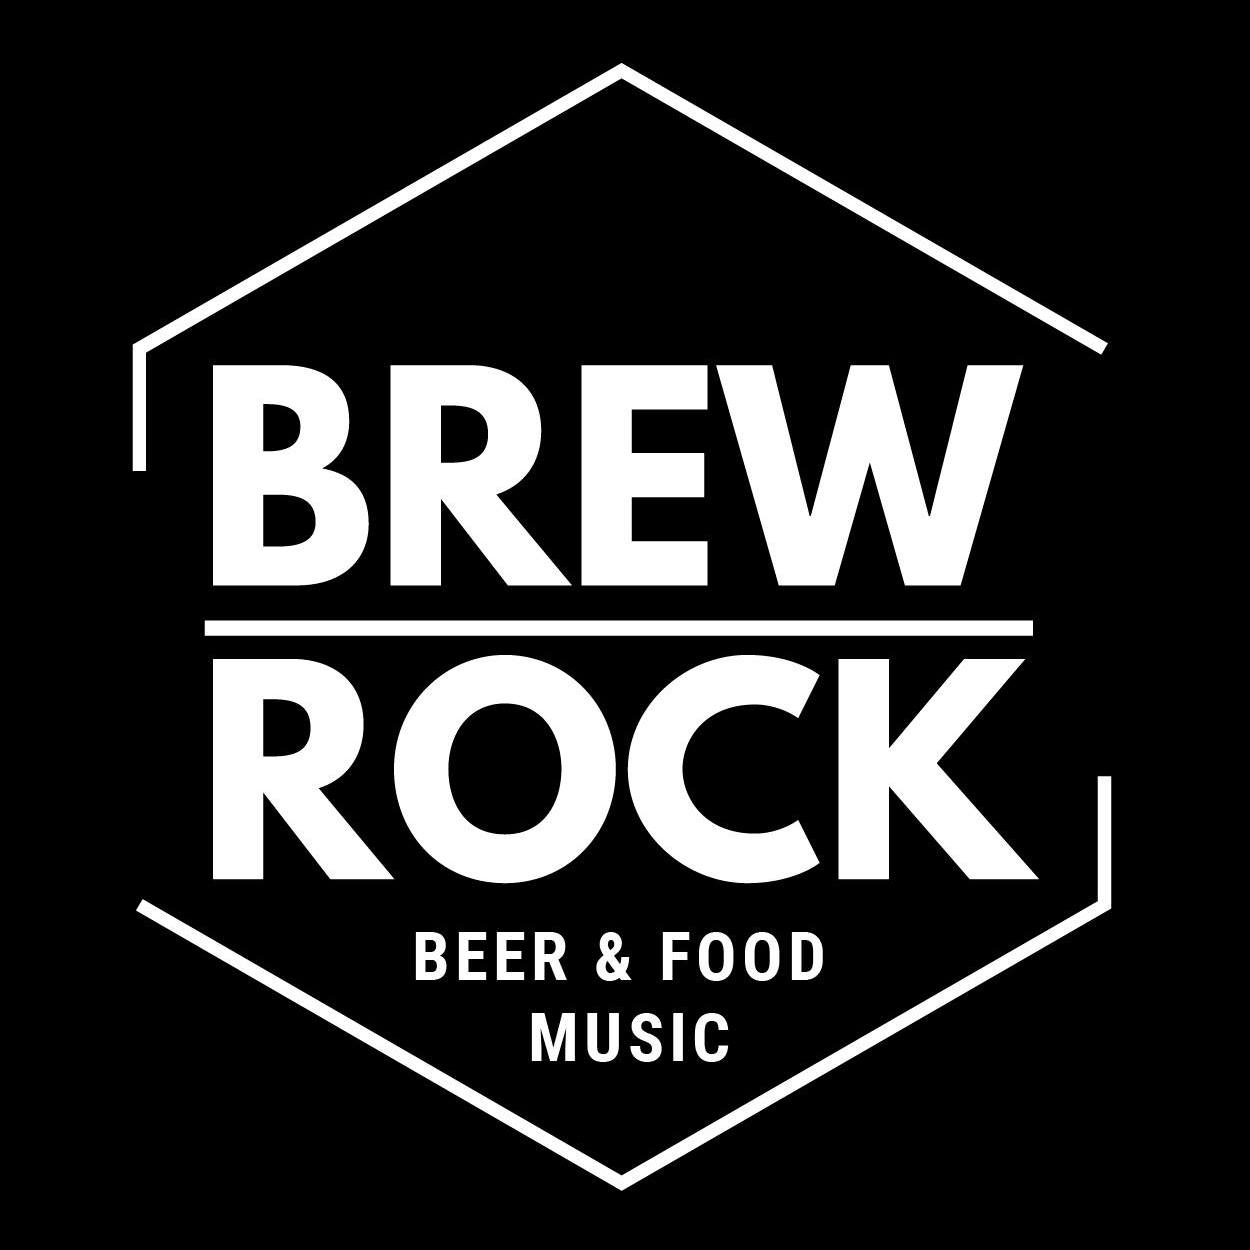 BREW ROCK